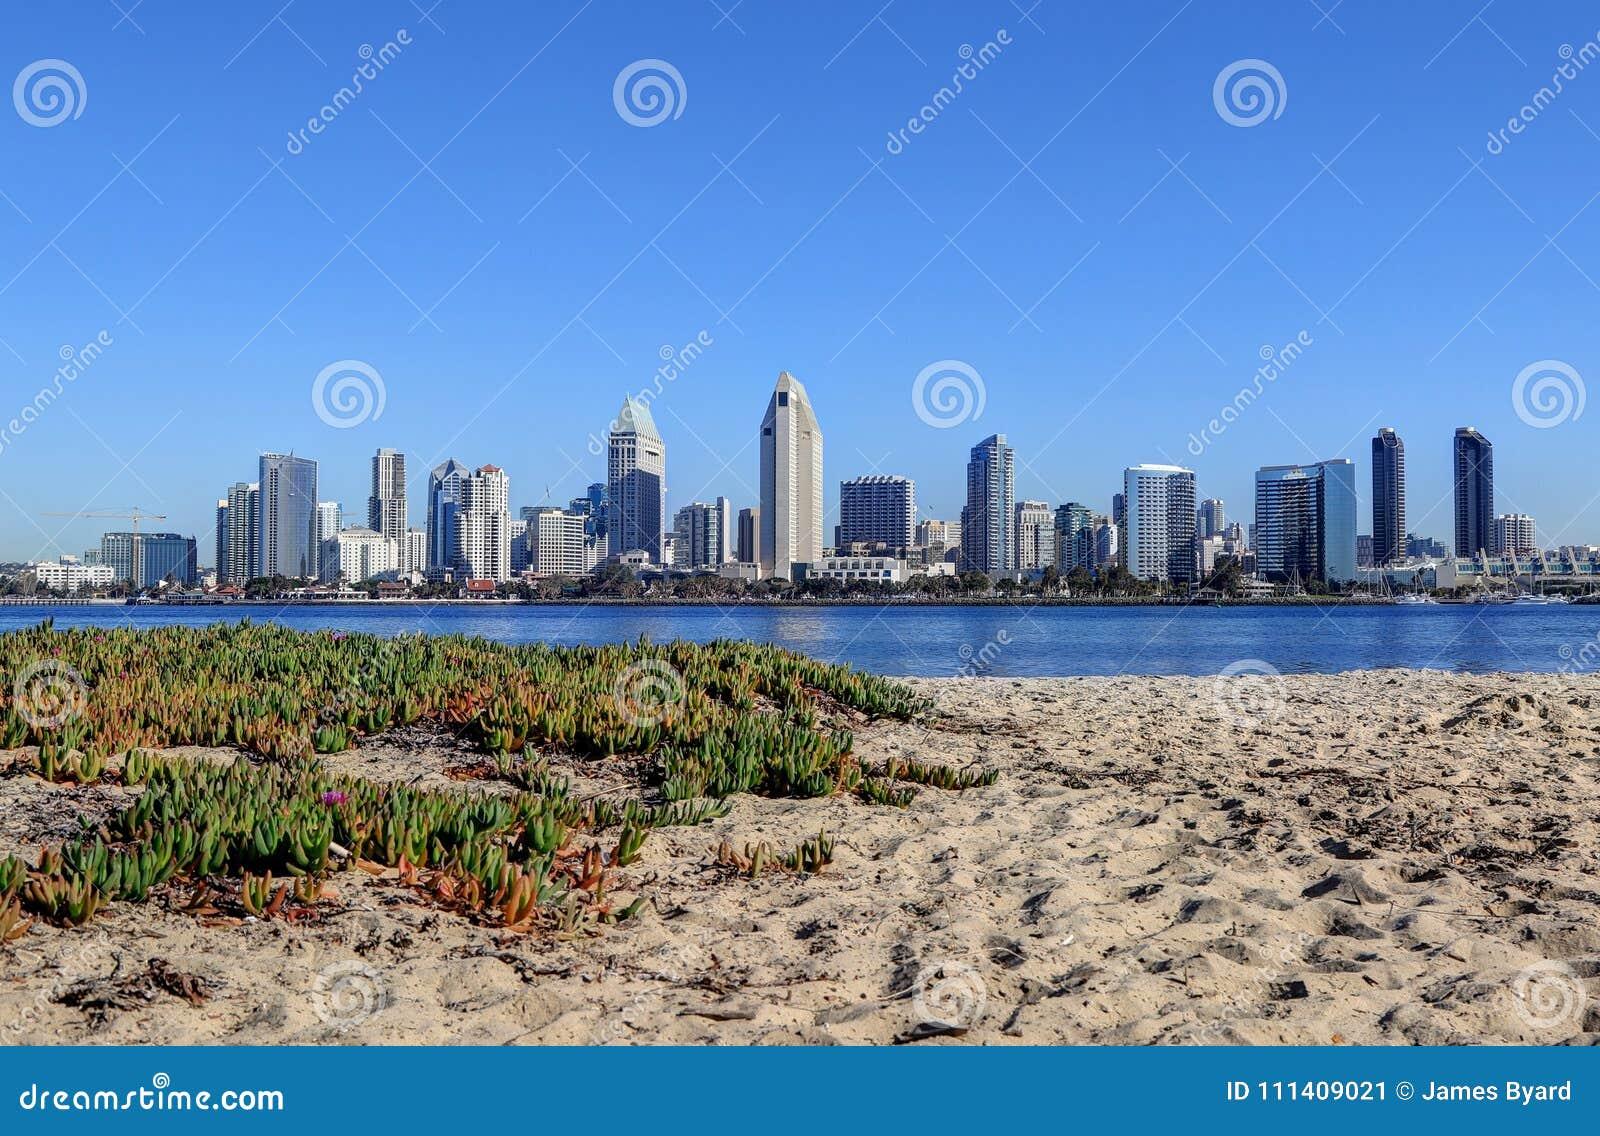 san diego california skyline from coronado island stock image image of district travel. Black Bedroom Furniture Sets. Home Design Ideas